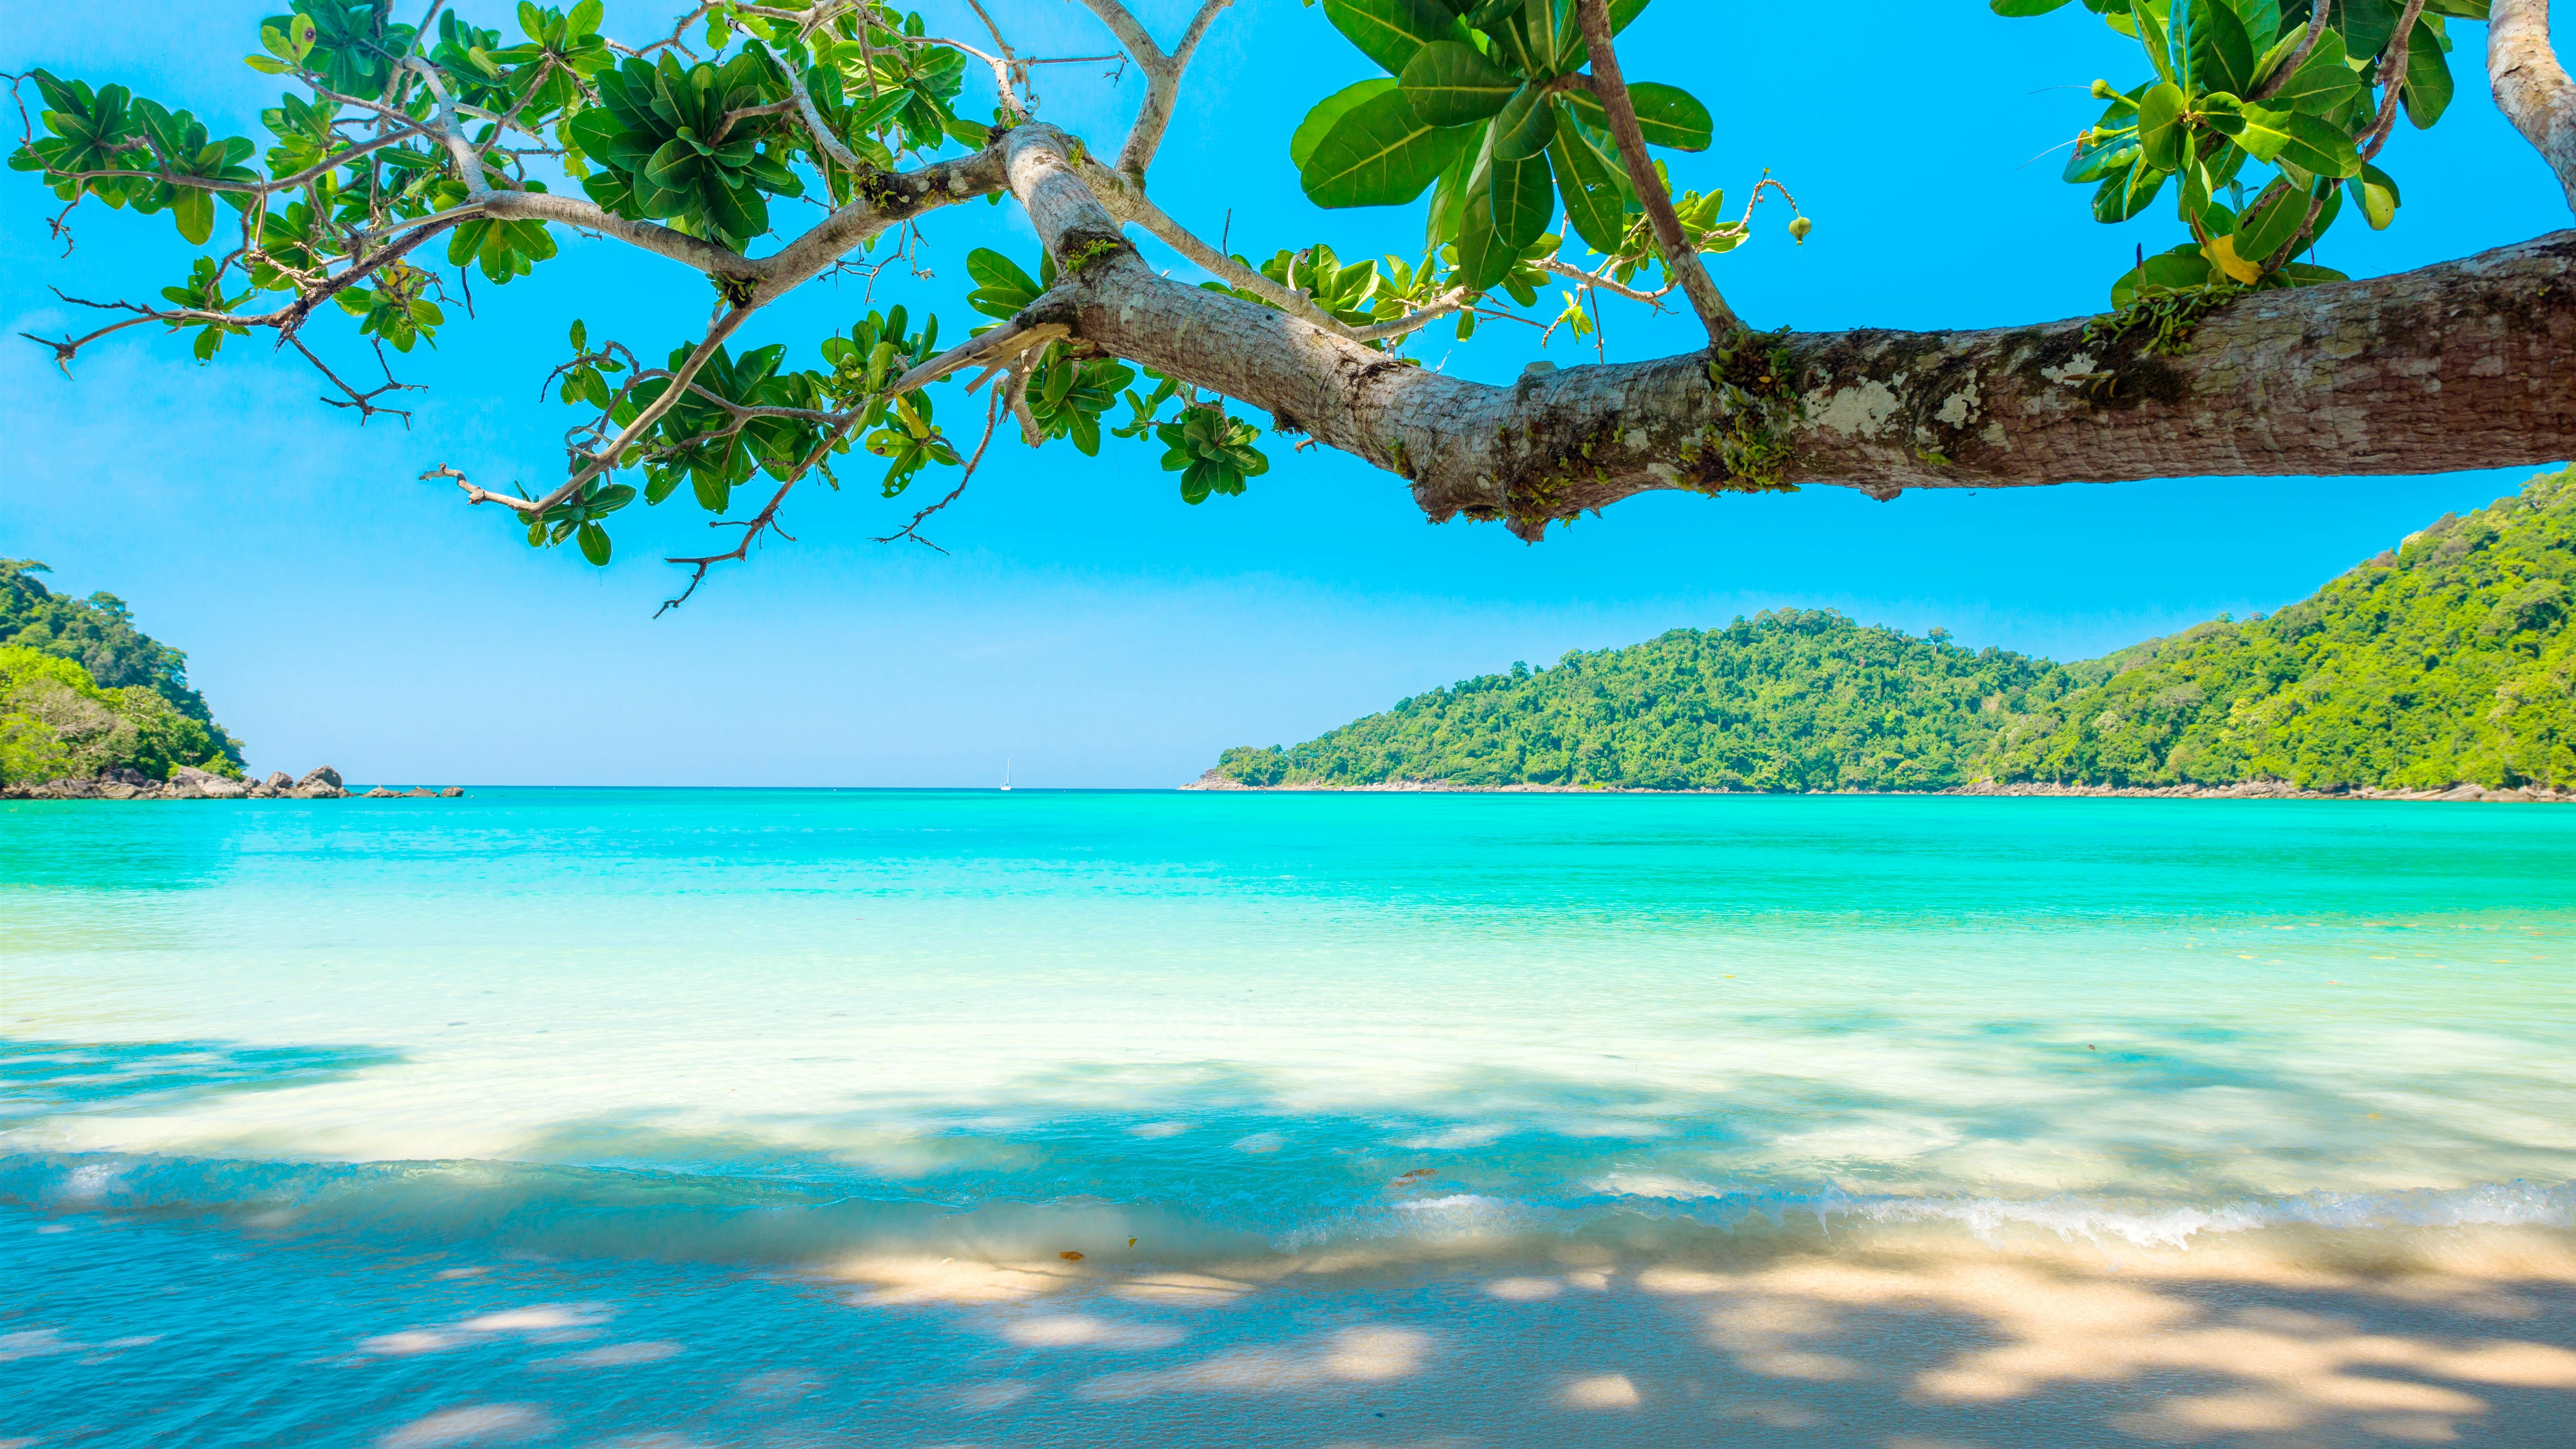 Wallpaper Beautiful Sea, Beach, Tree, Tropical 5120x2880